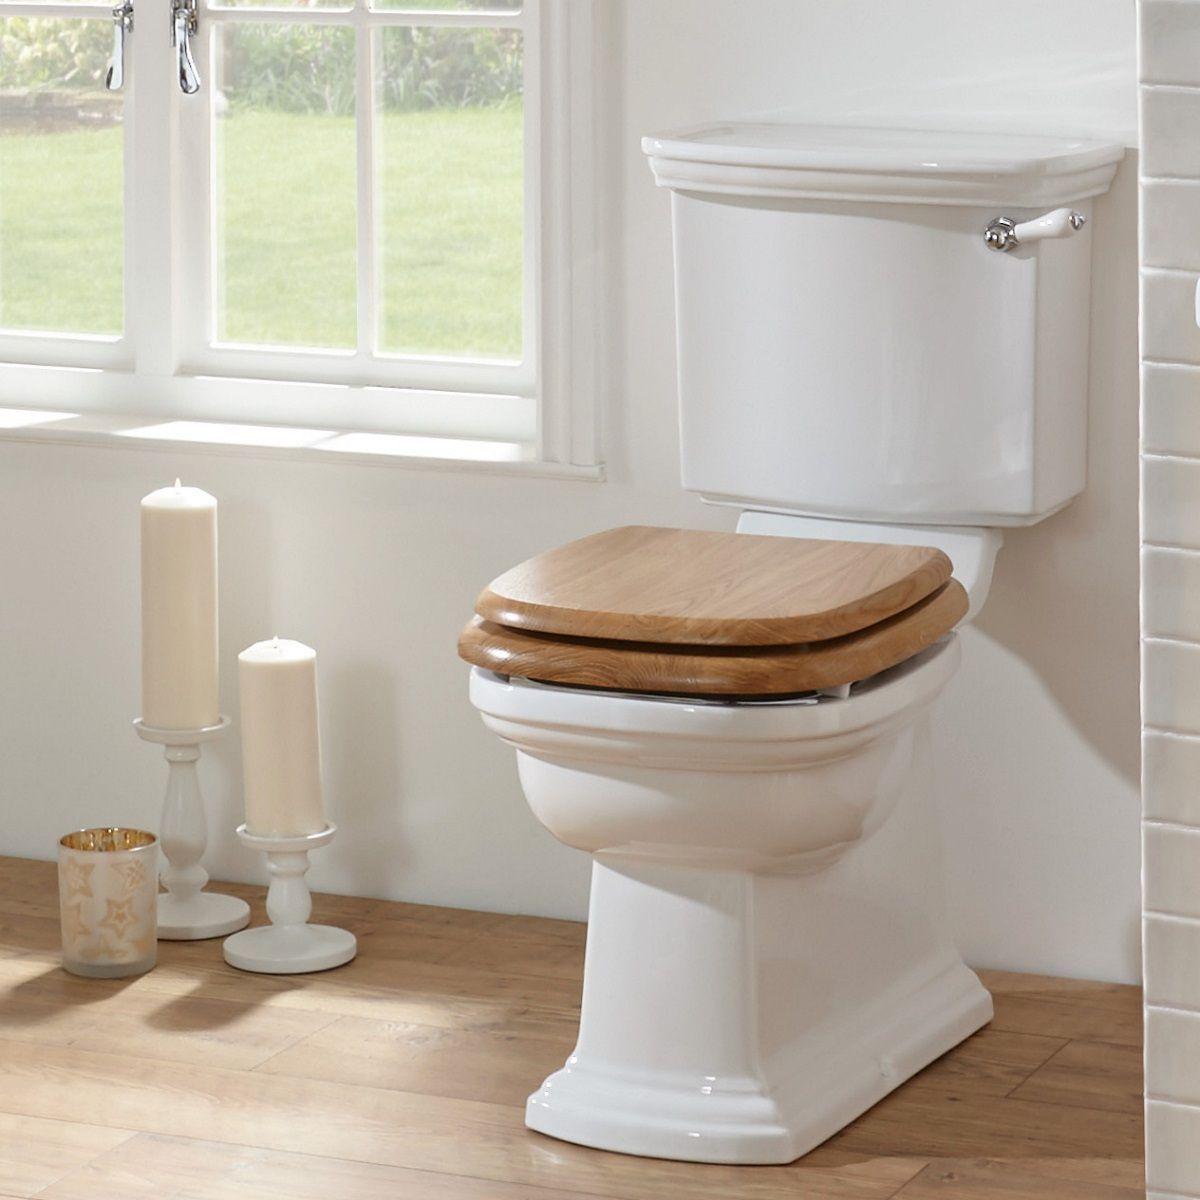 Imperial Radcliffe Toilet.jpg